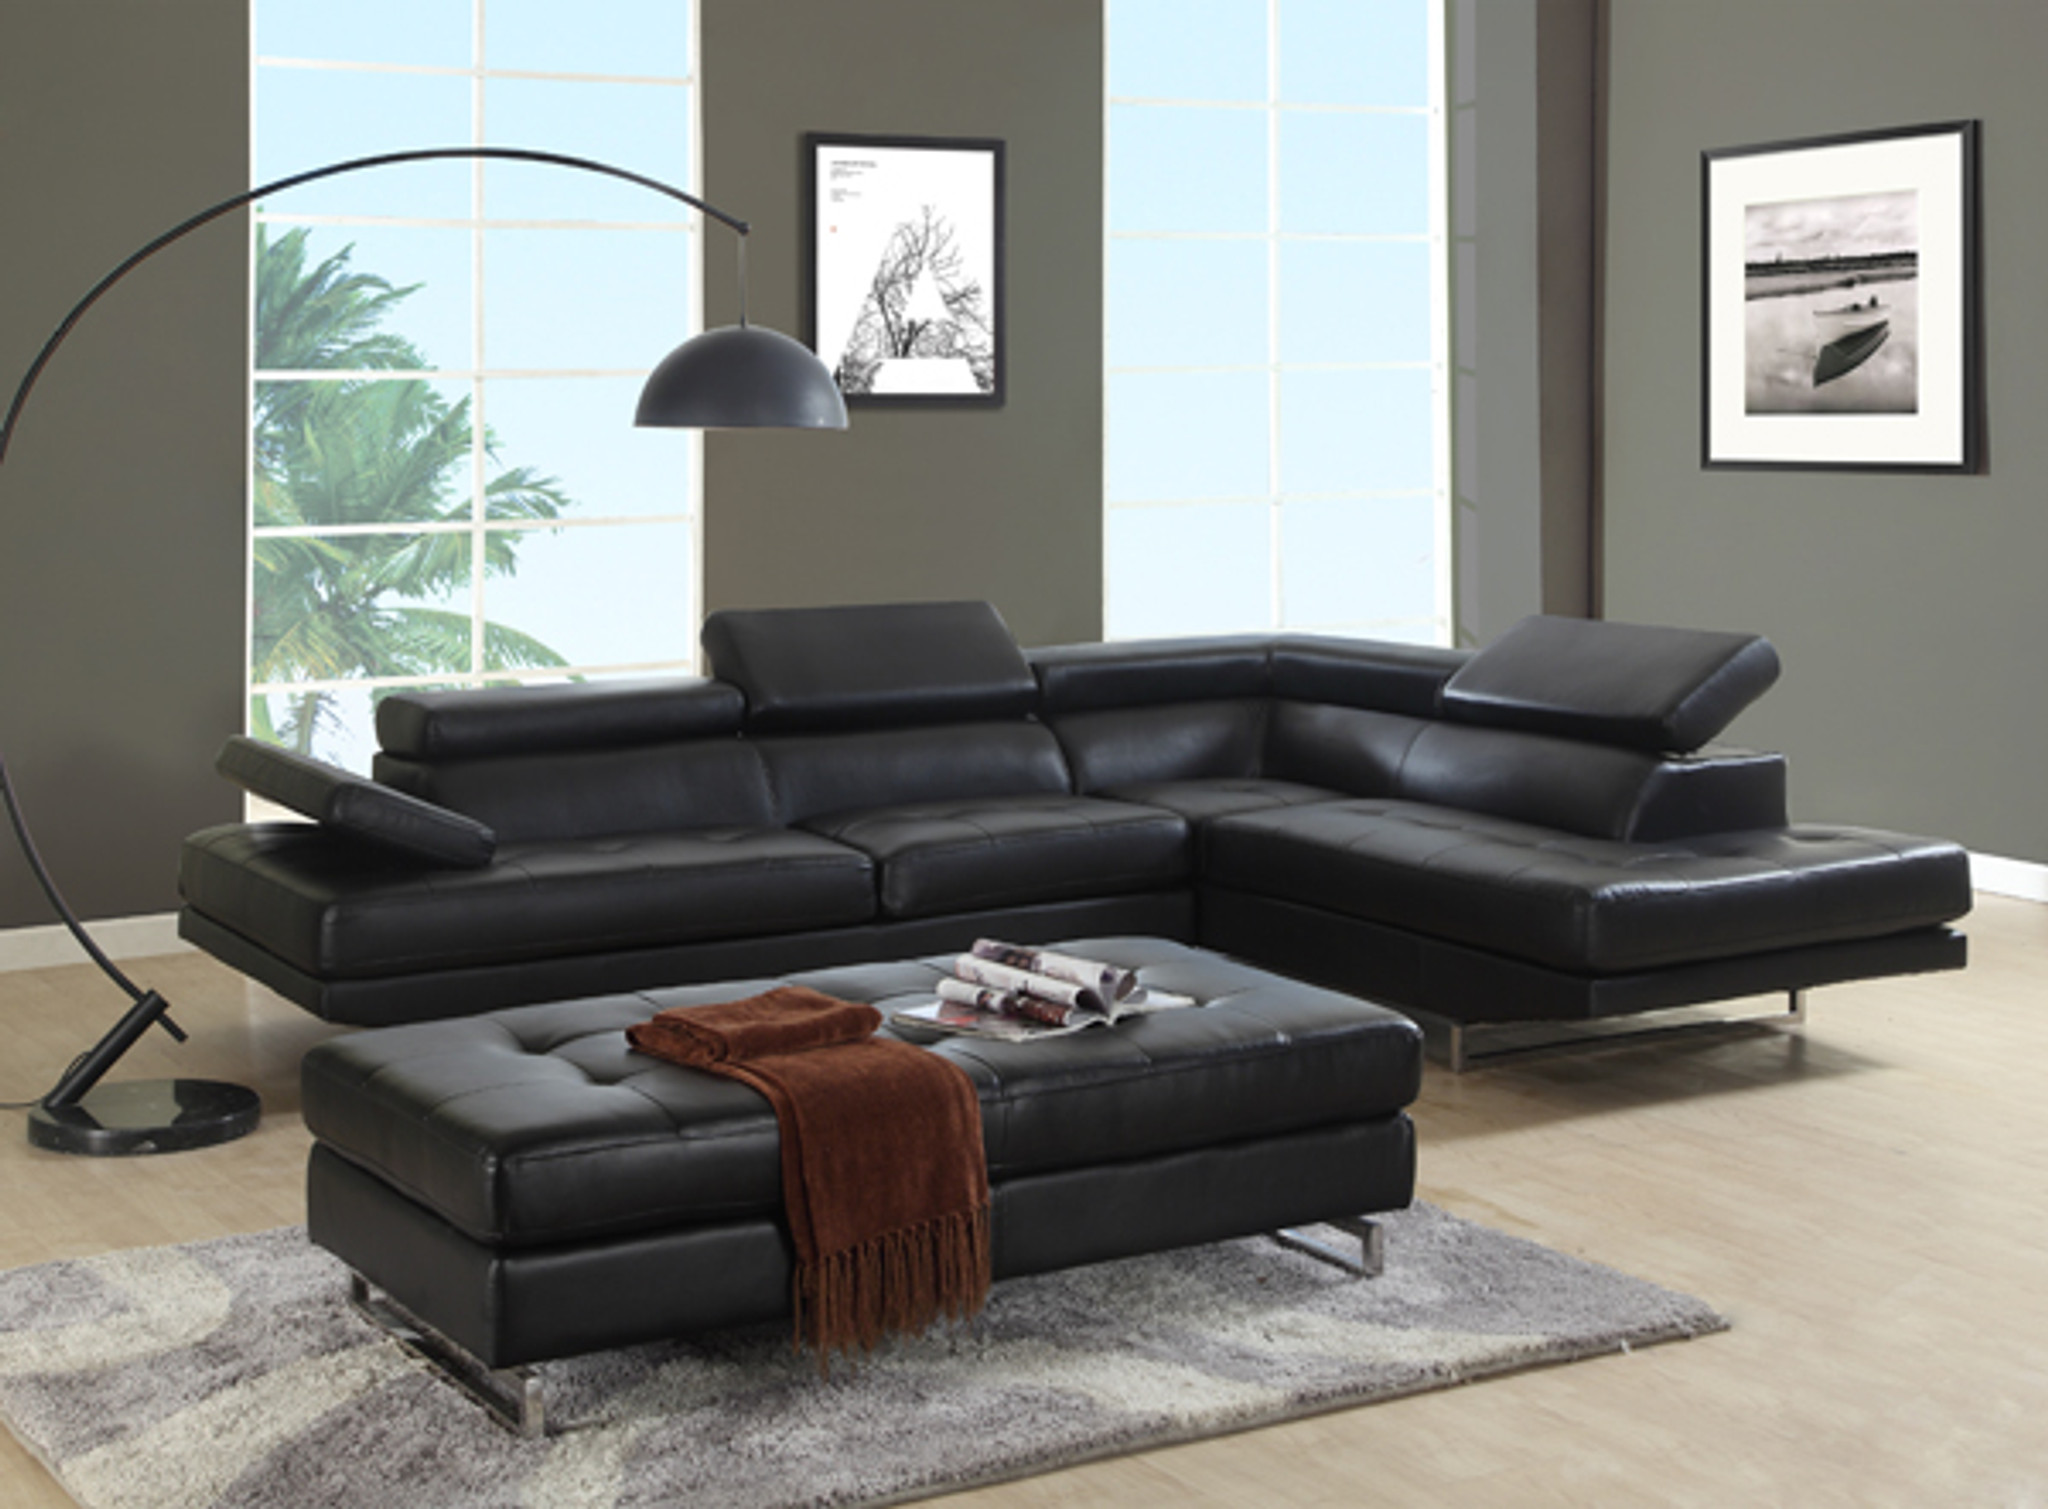 Kassa Mall Home Furniture U8136 In Black Modern Sectional Set U8136 In Black Leather